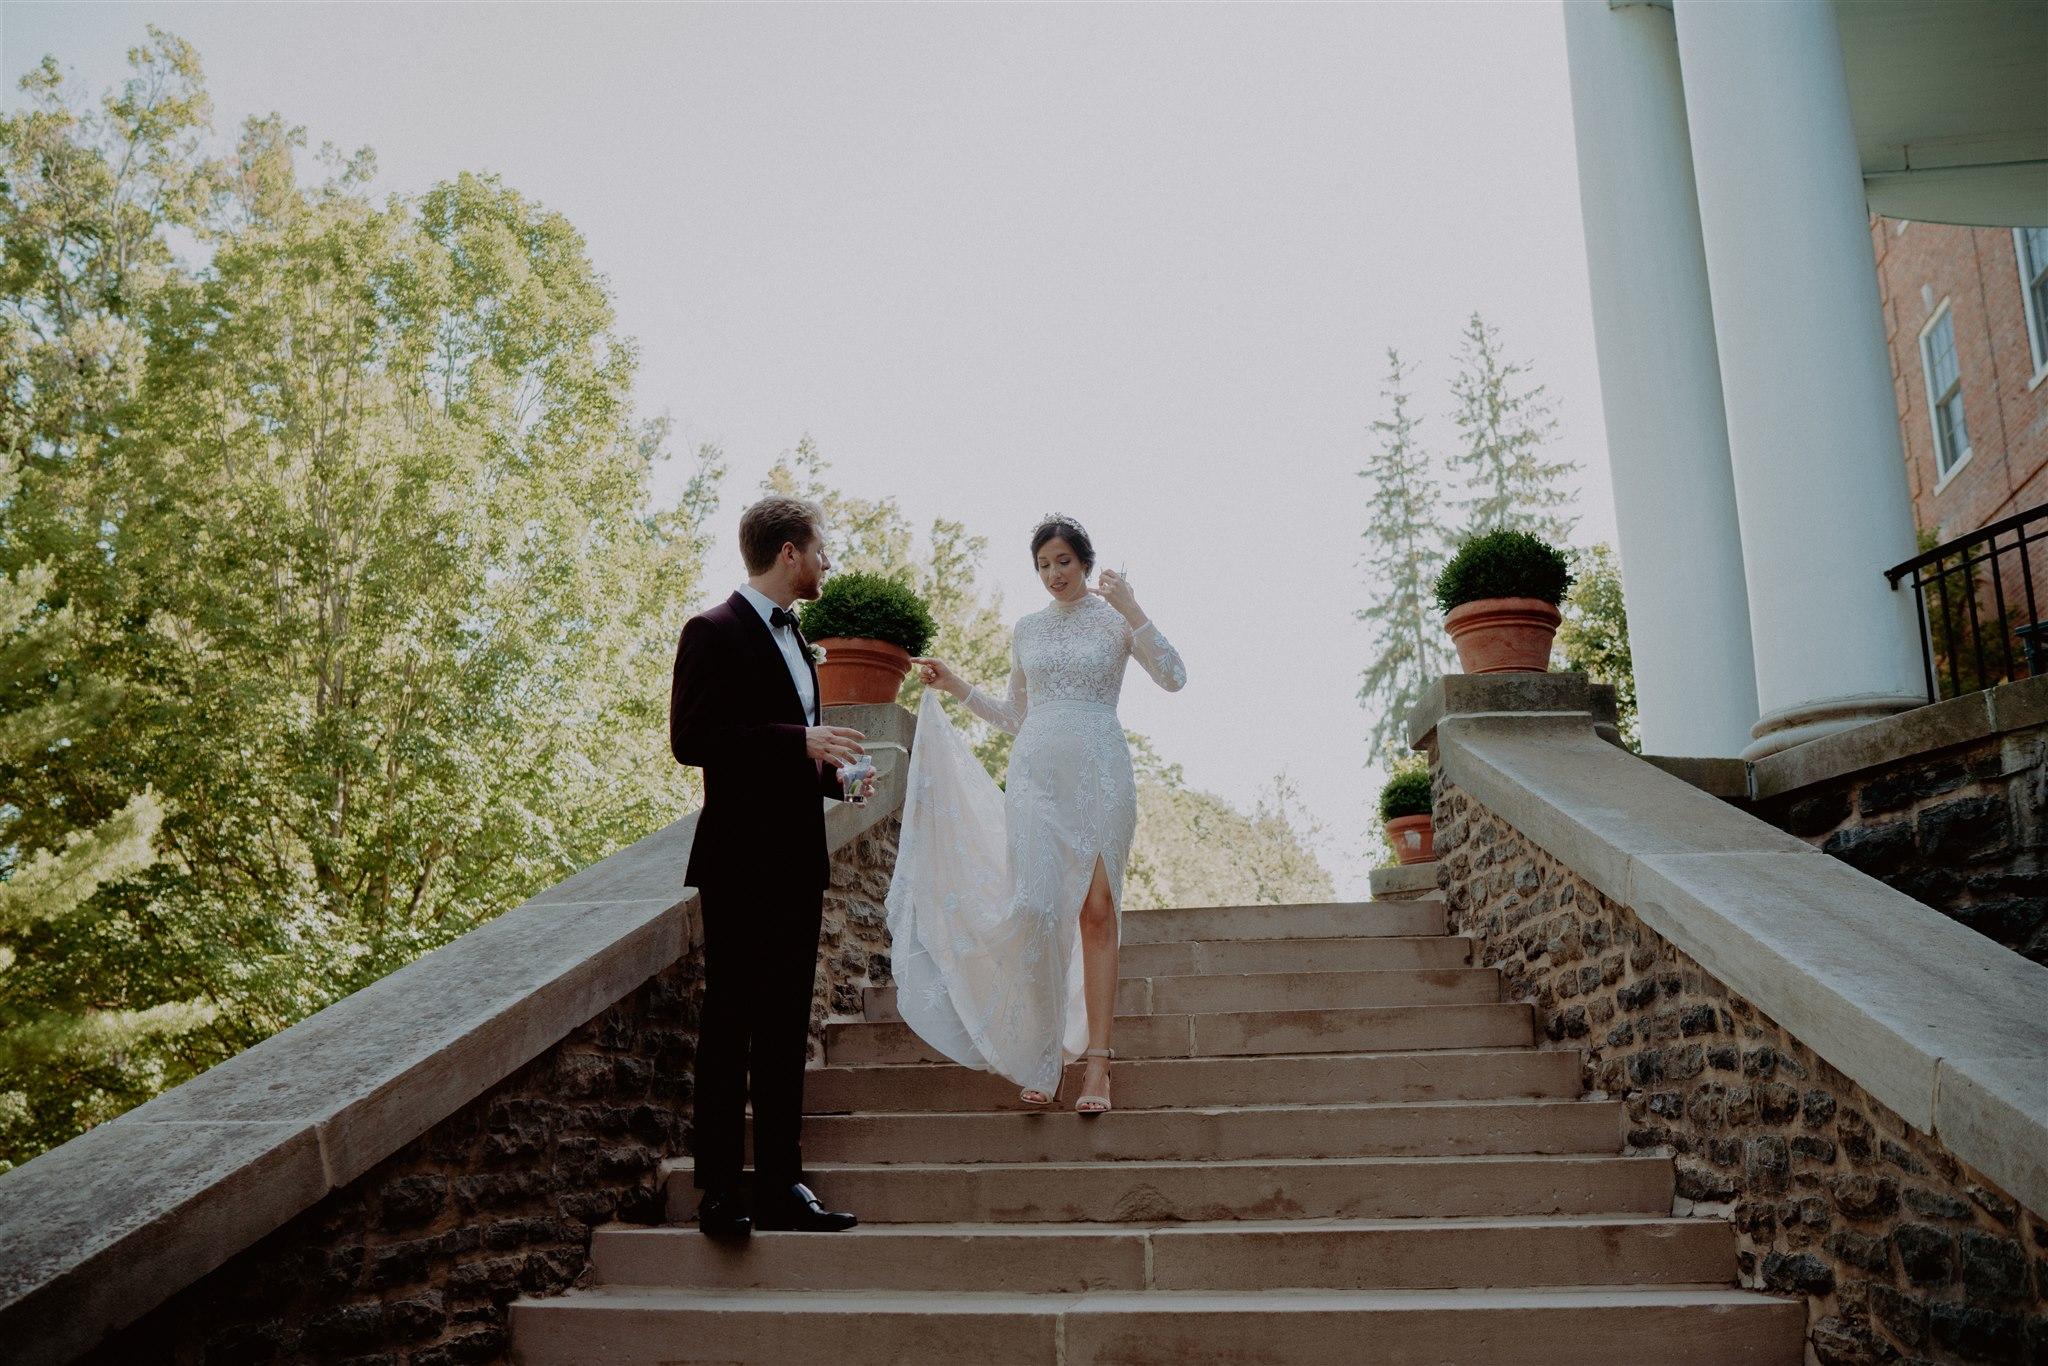 Chellise_Michael_Photography_Hudson_Valley_Wedding_Photographer_Otesaga_Hotel-4043.jpg